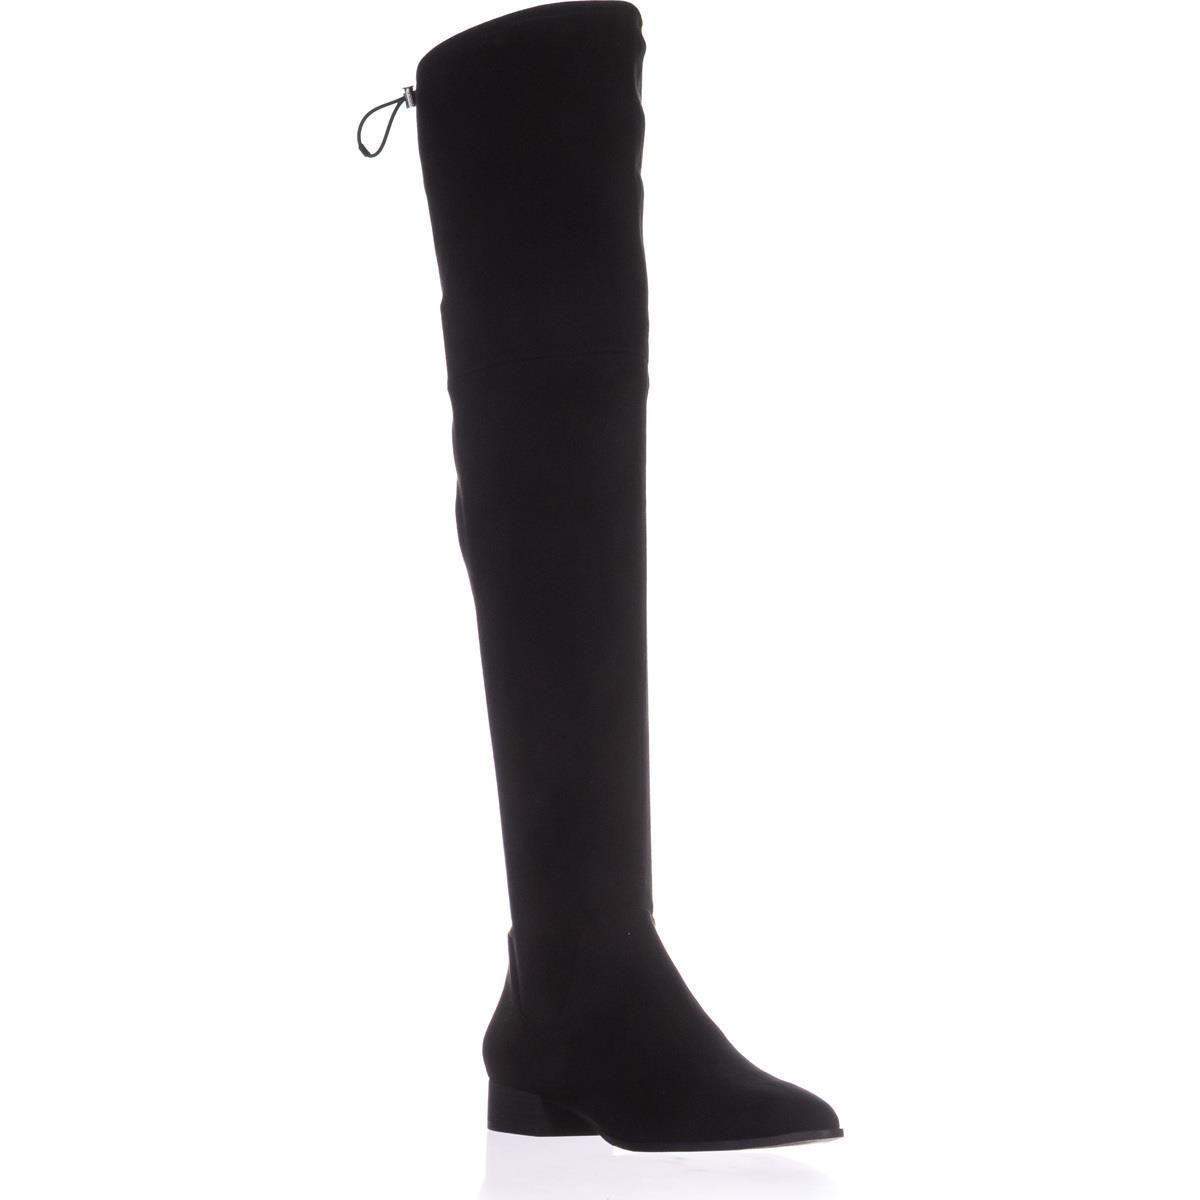 DKNY Tyra Wide Calf Over The Knee Boots, Black, 8 US / 38.5 EU